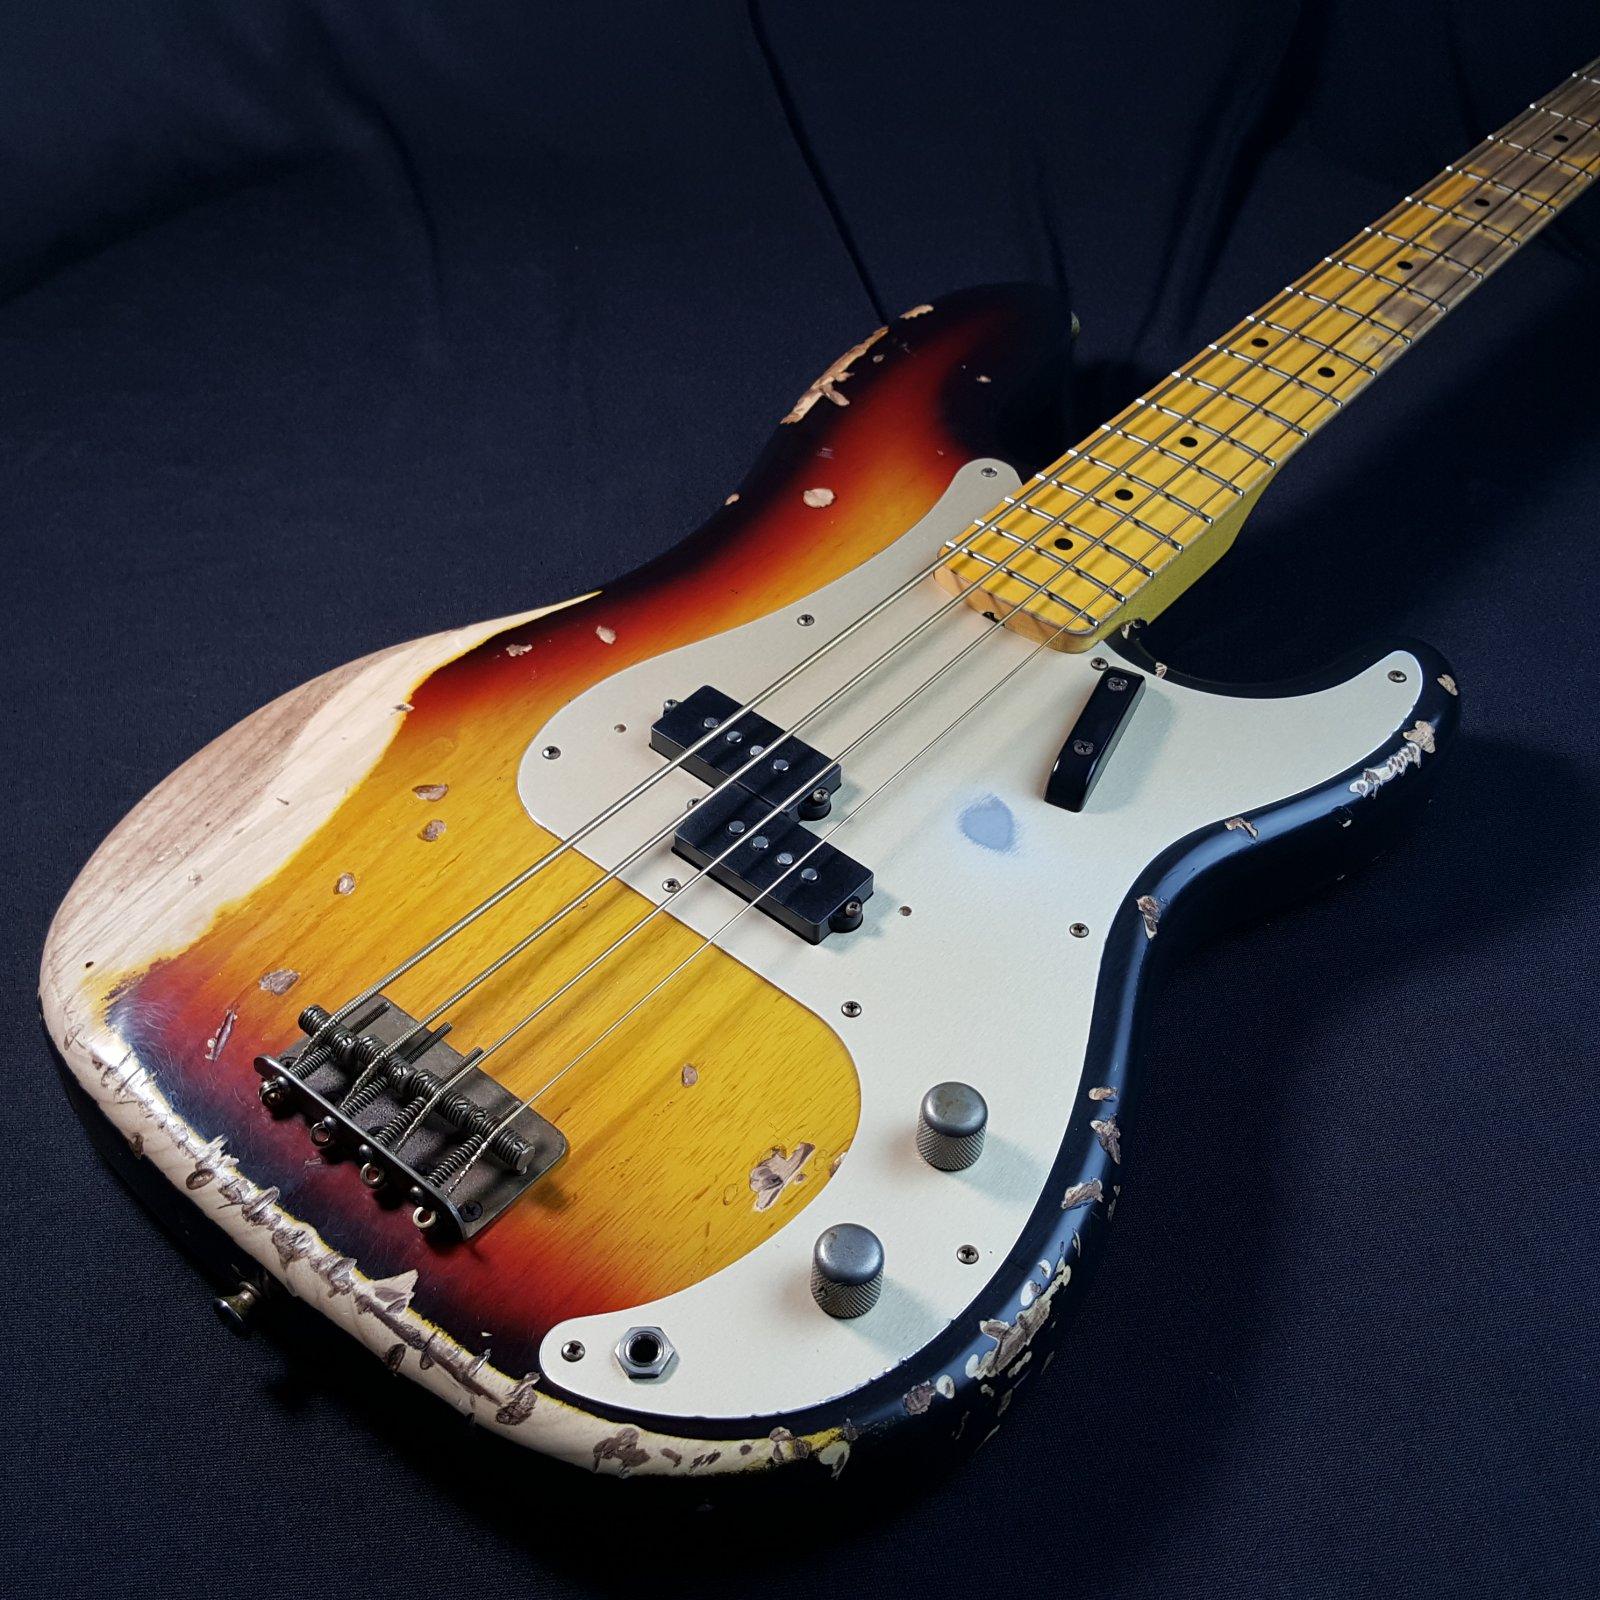 USED Bill Nash PB57 Tobacco Burst Precision Bass w/ Original Hard Case